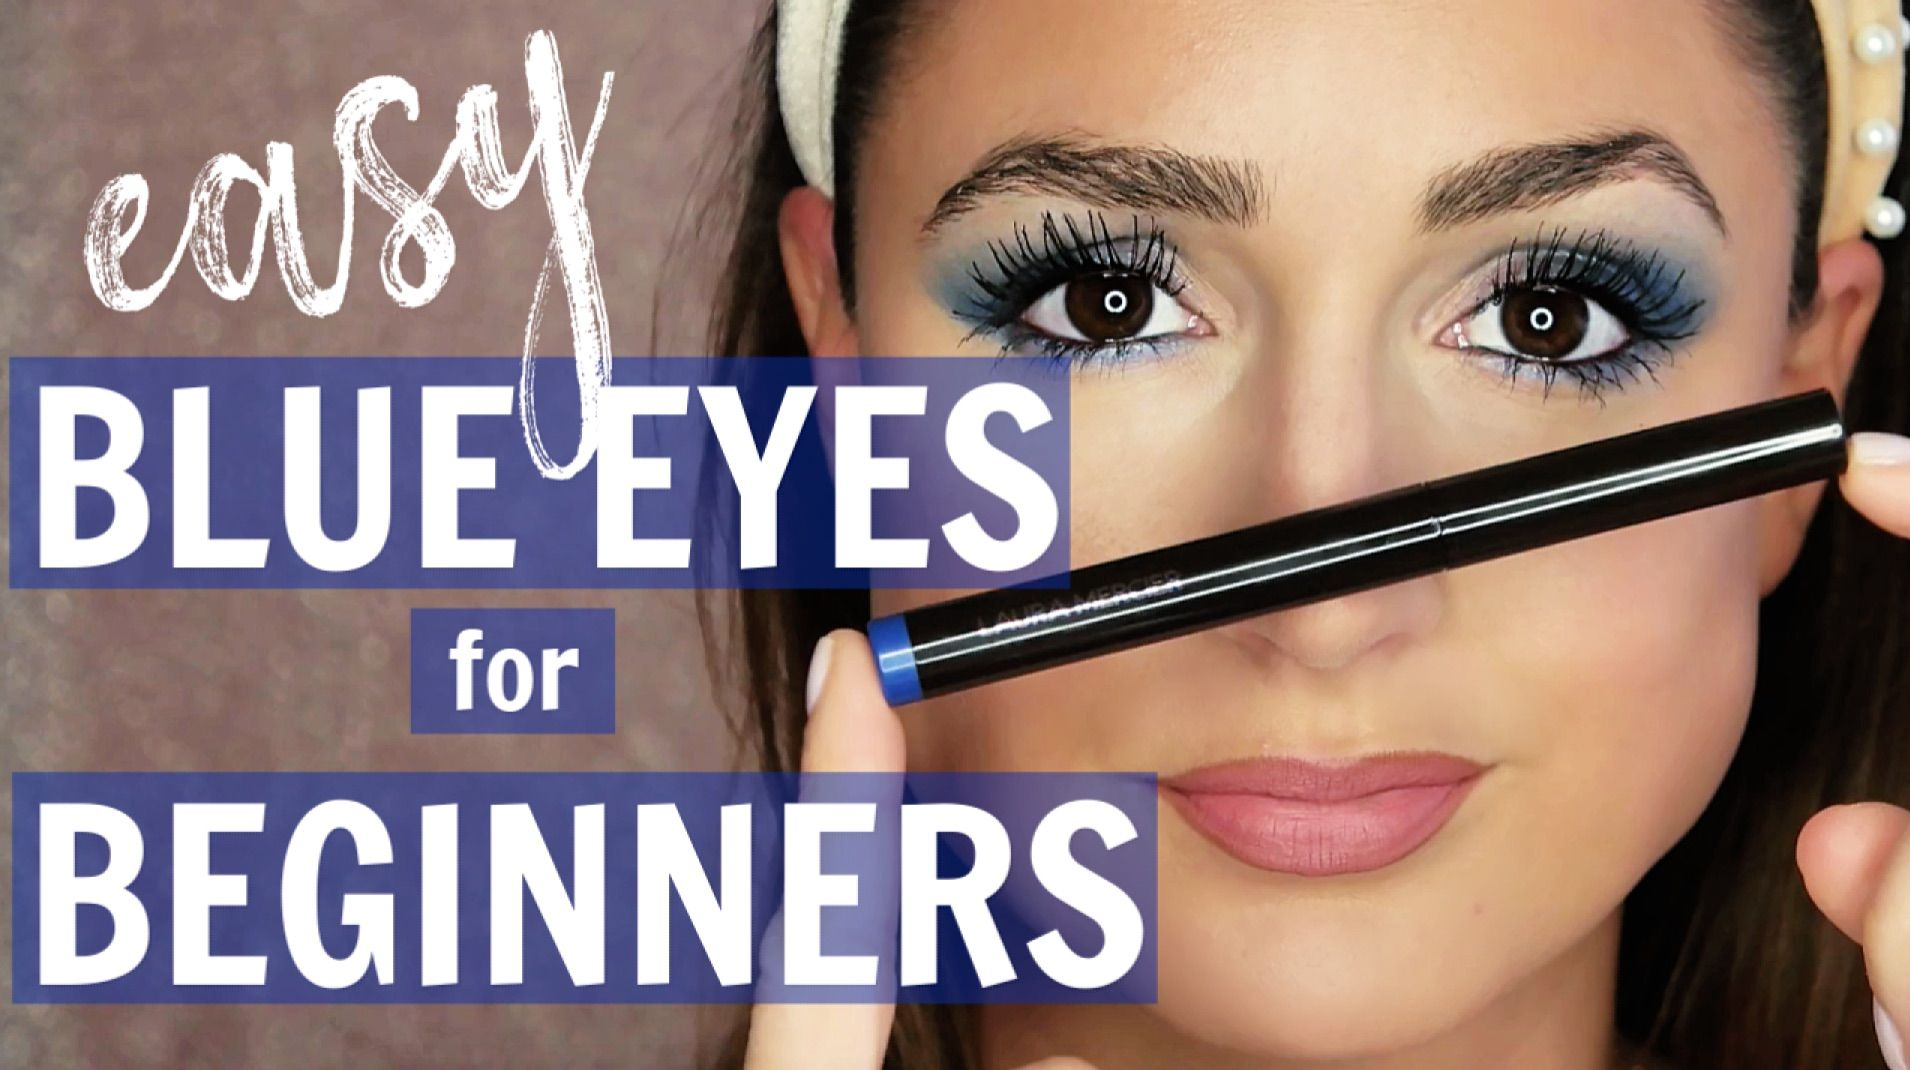 Blue Eyes for Beginners in 2020 Beauty lipstick, Gloss